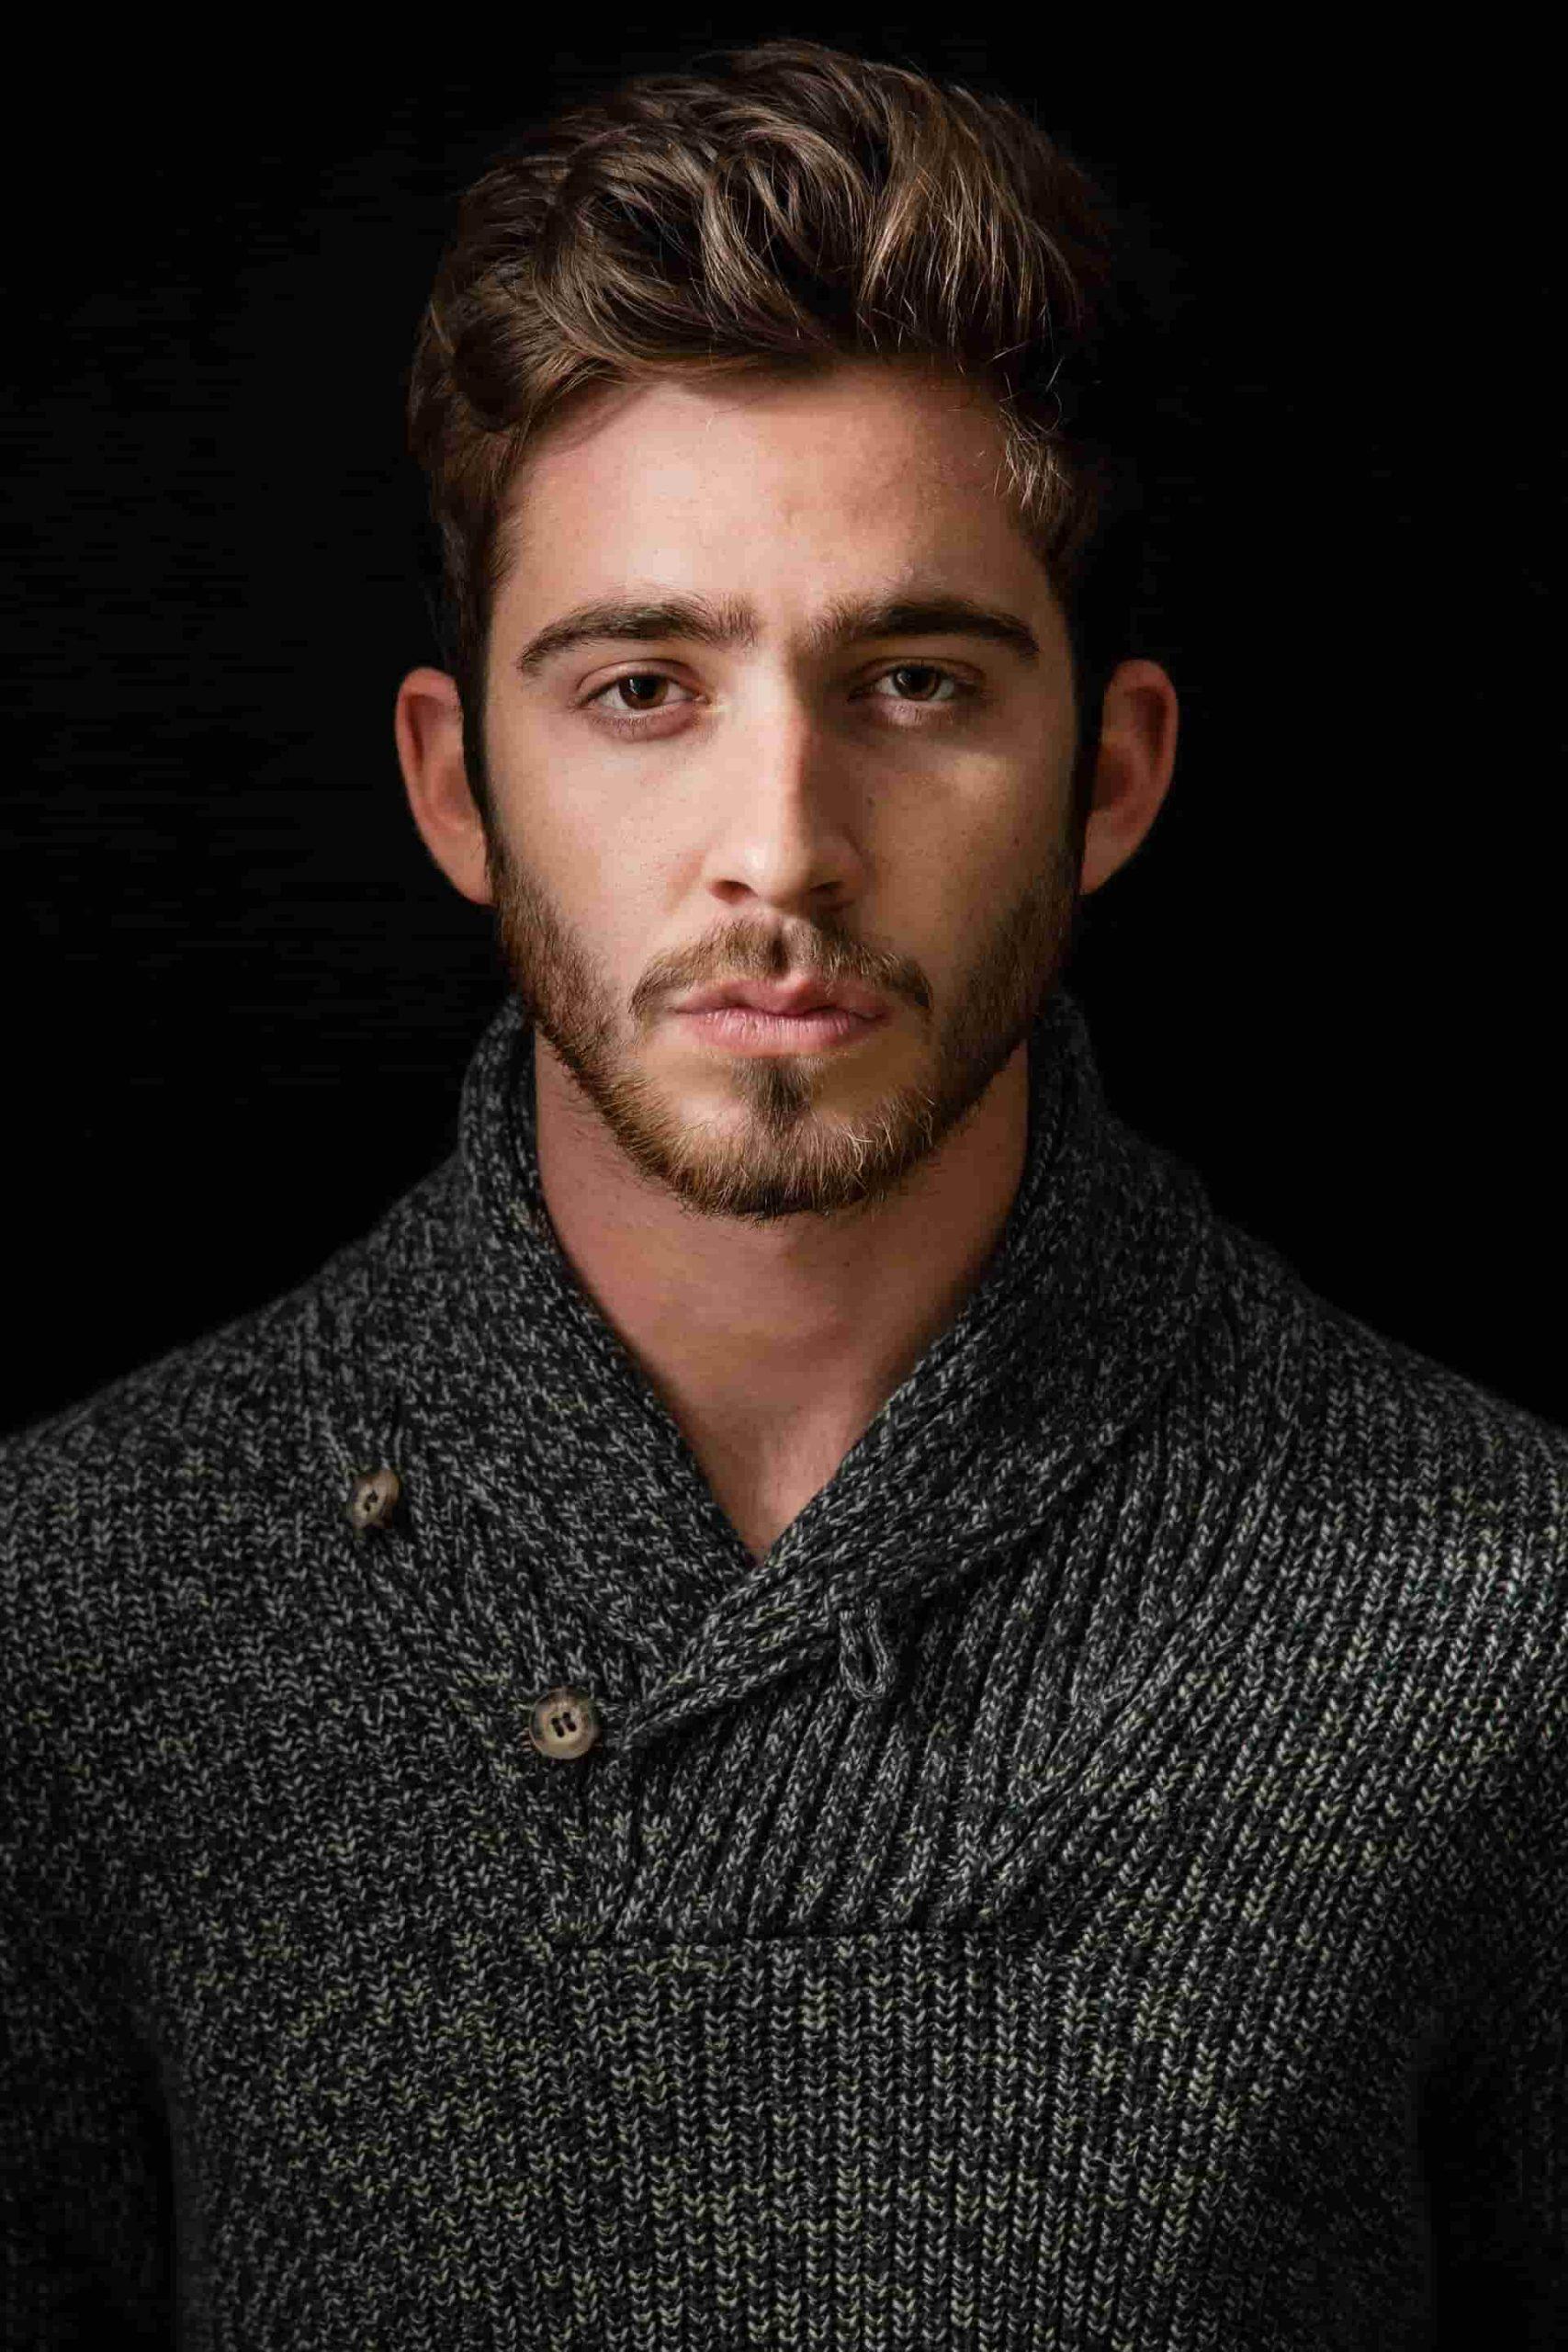 Headshot Photography Mistakes; portrait photo of a man